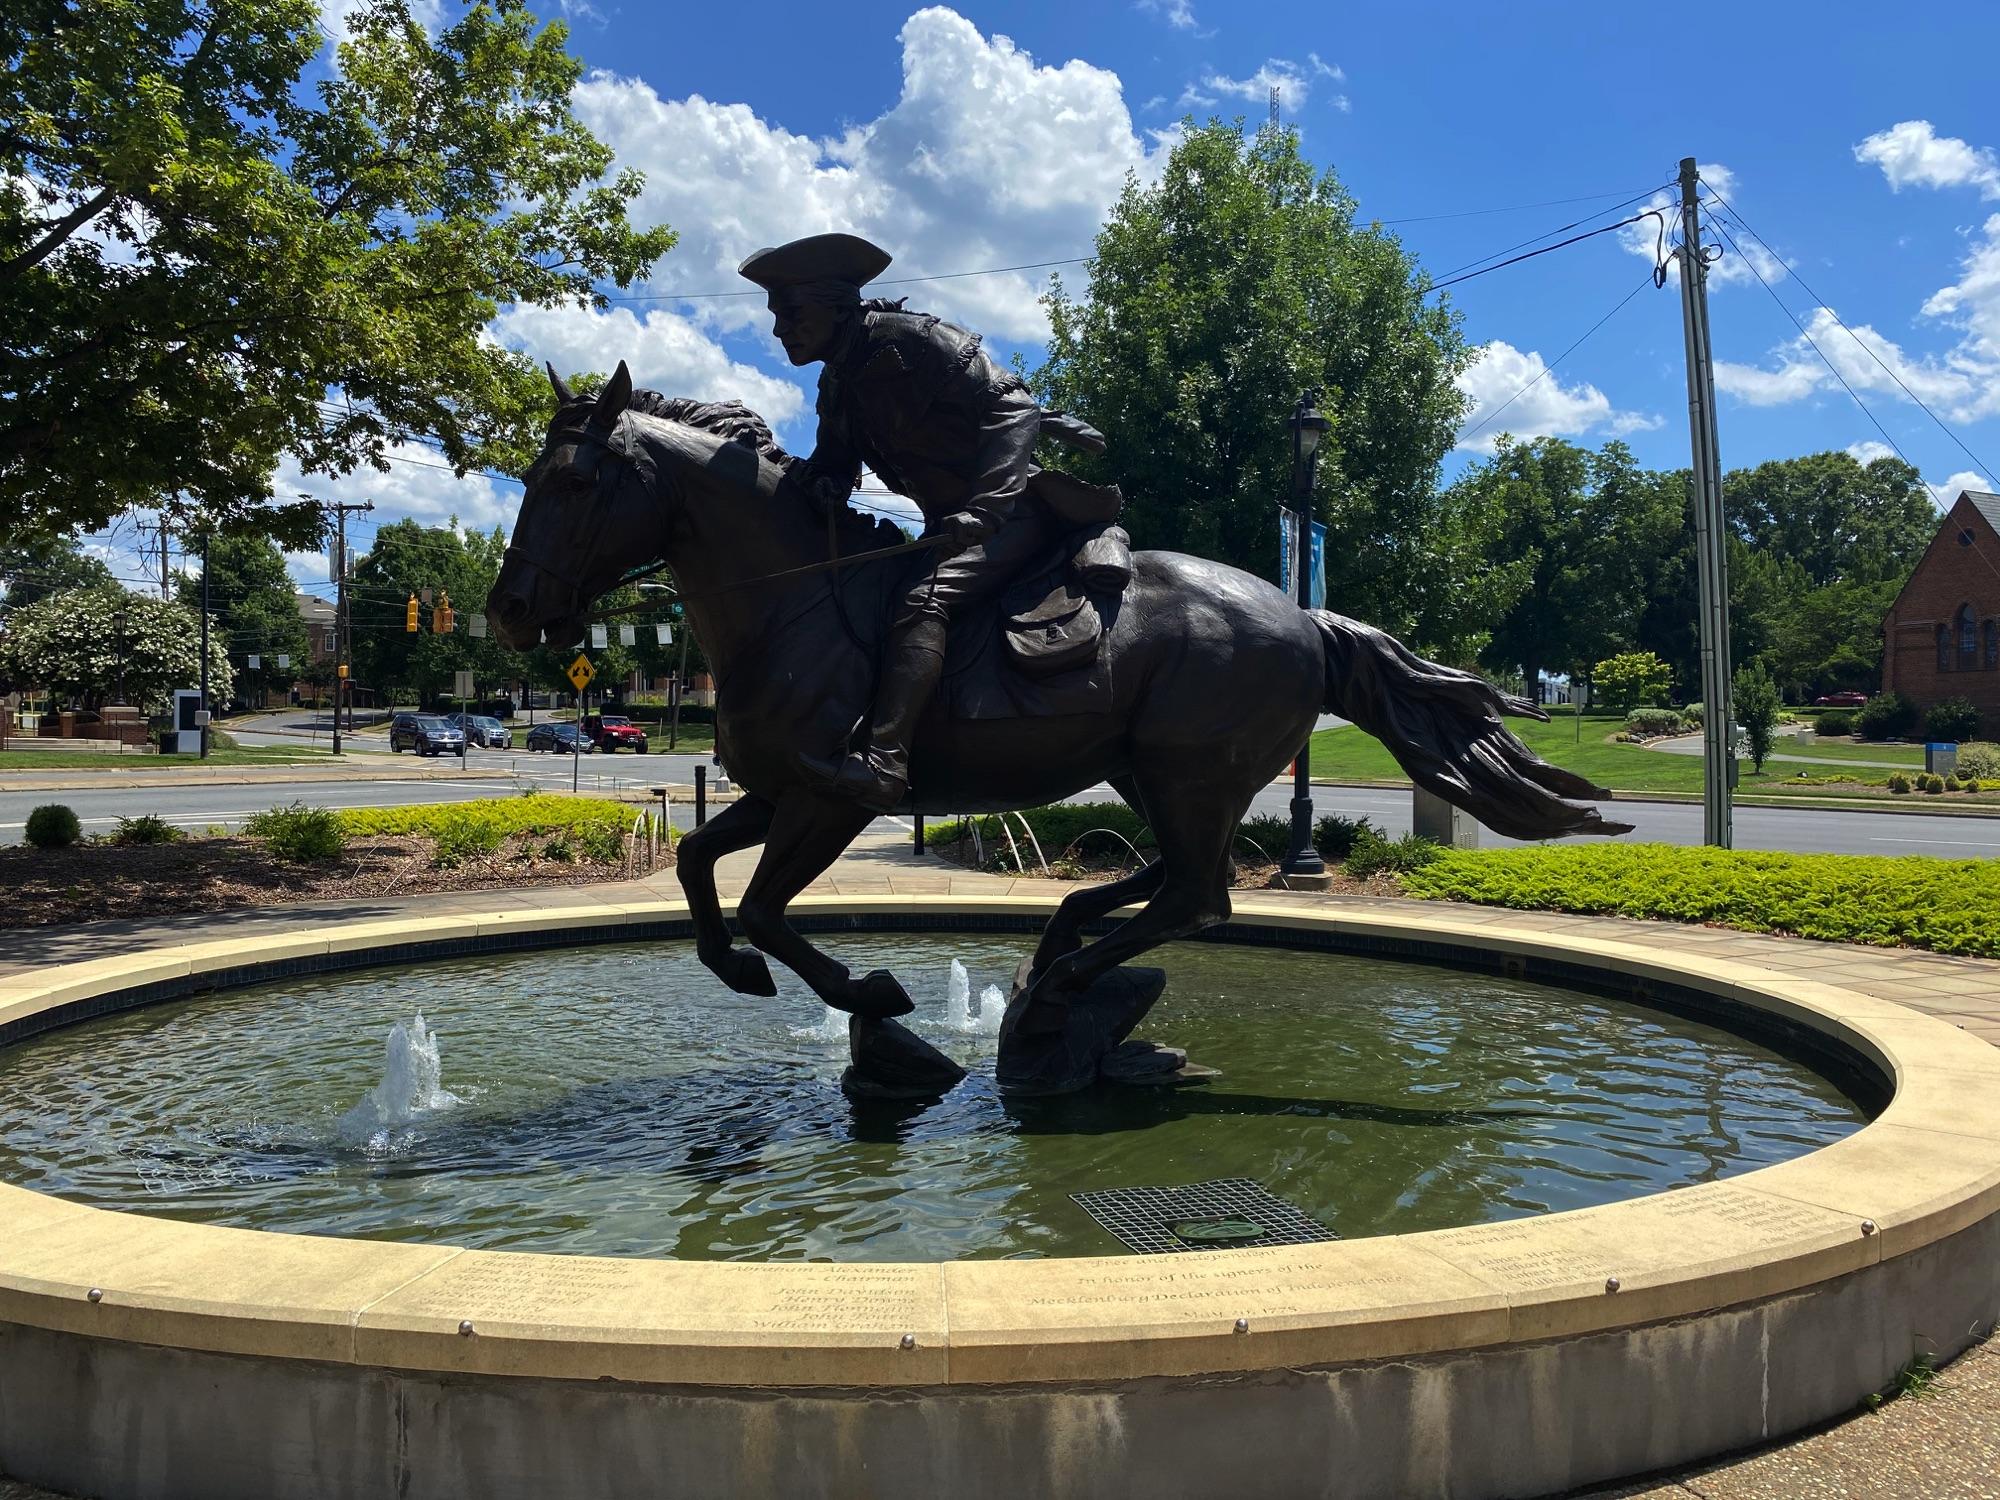 Heading through Elizabeth Park, Charlotte NC